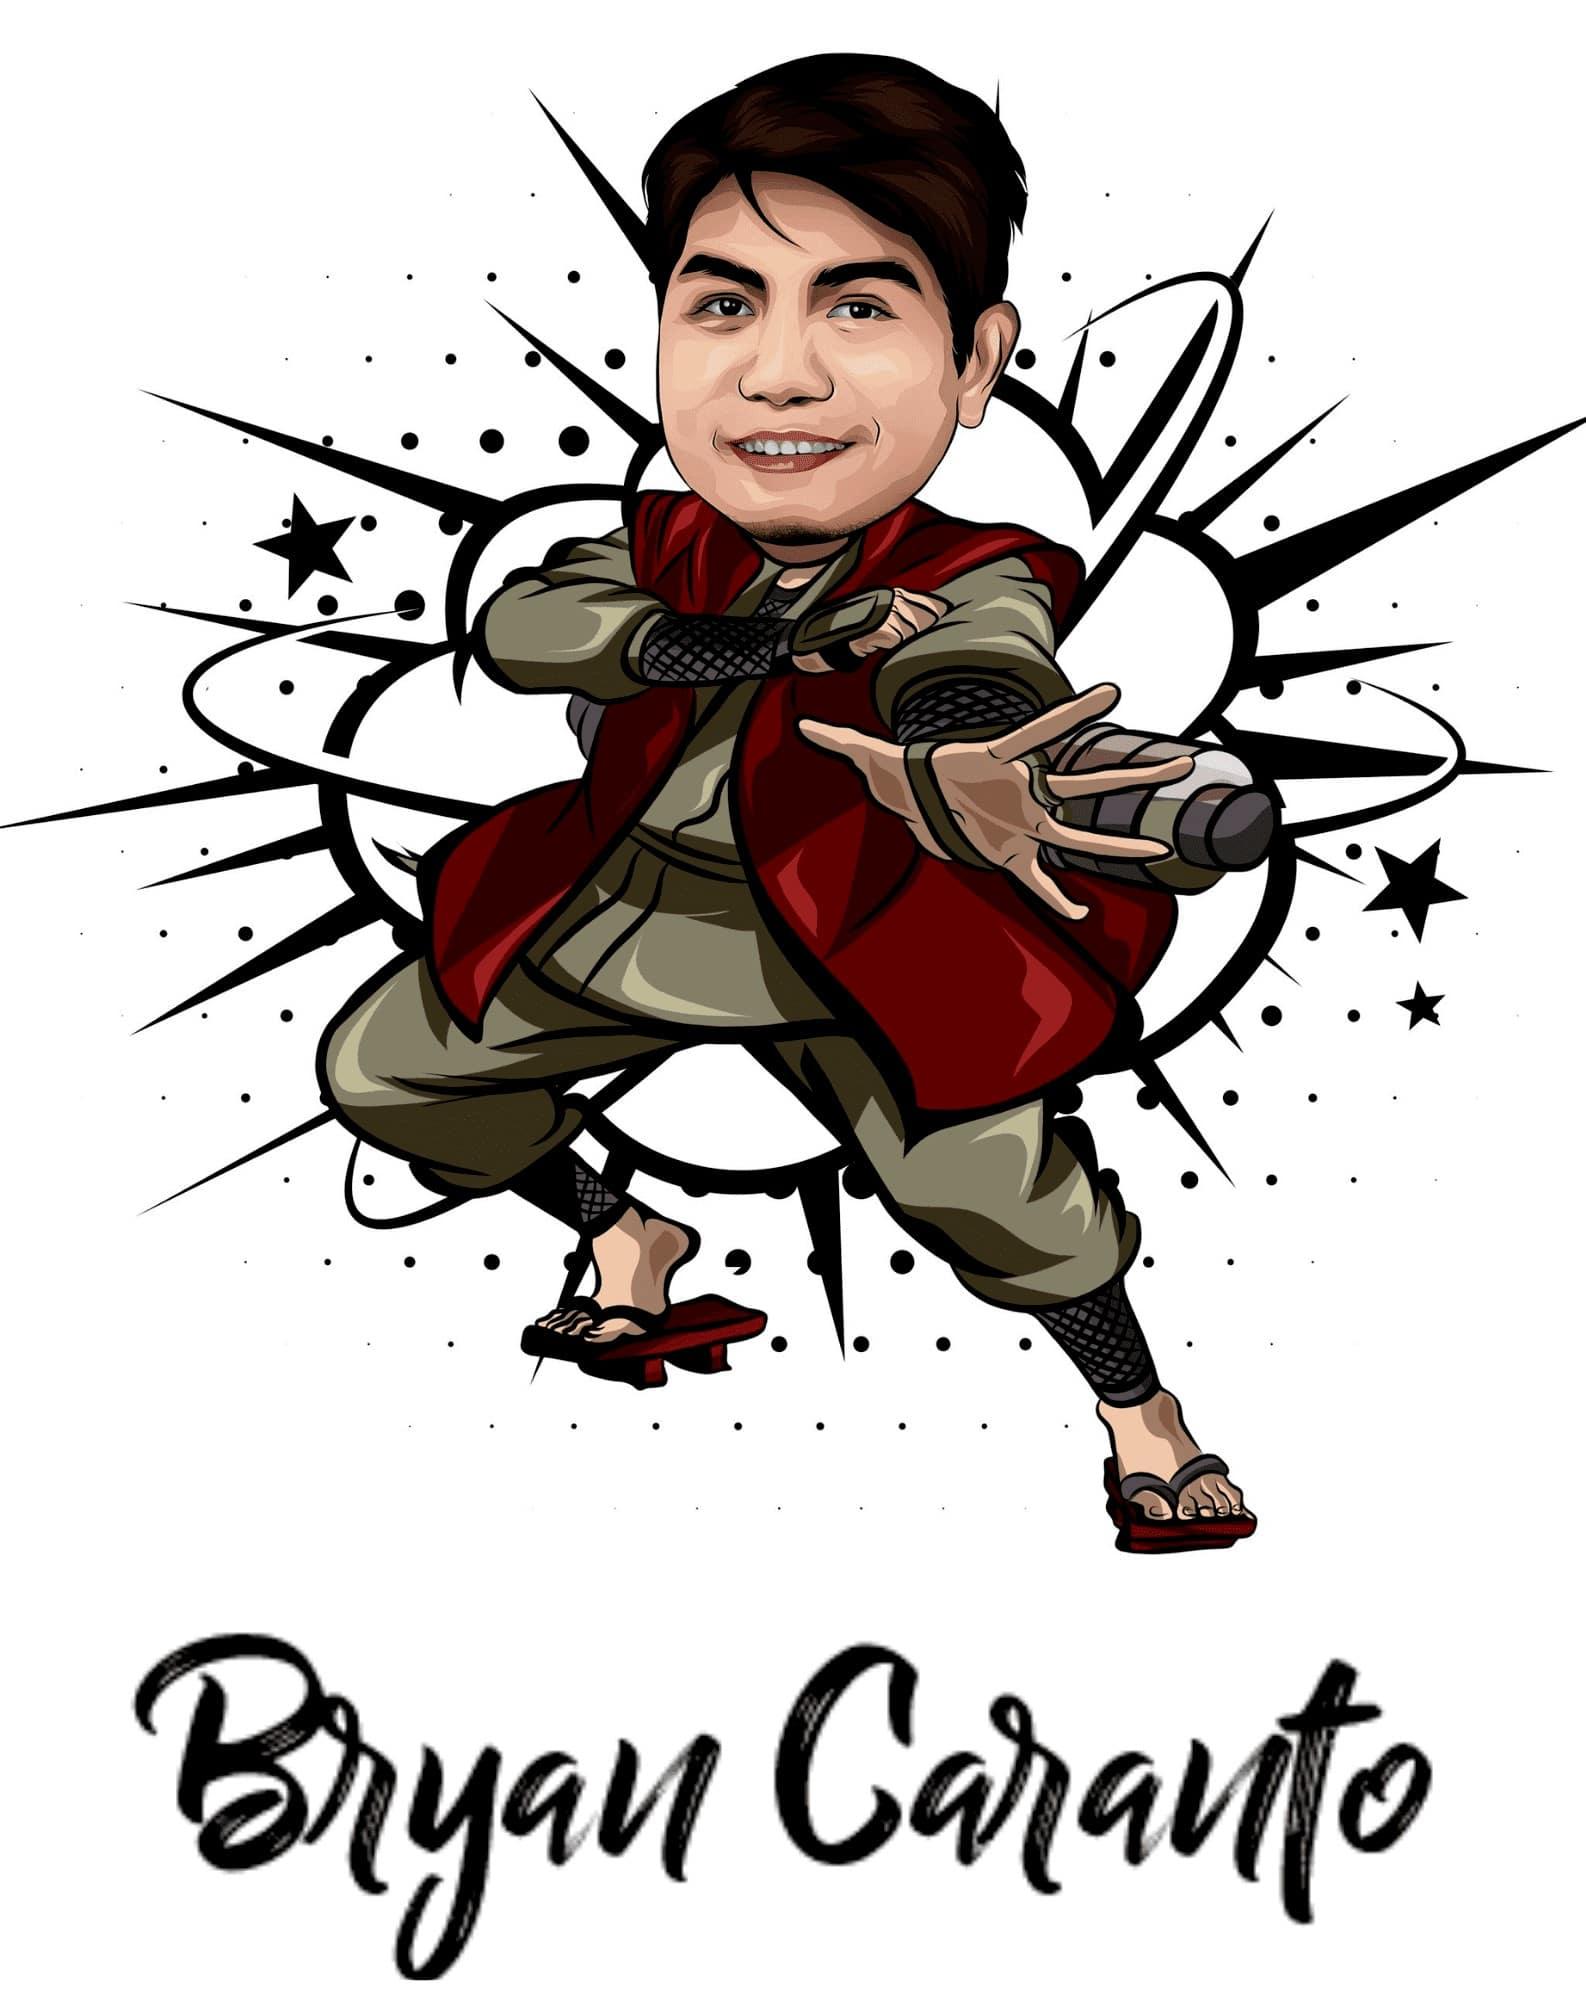 Bryan Caranto